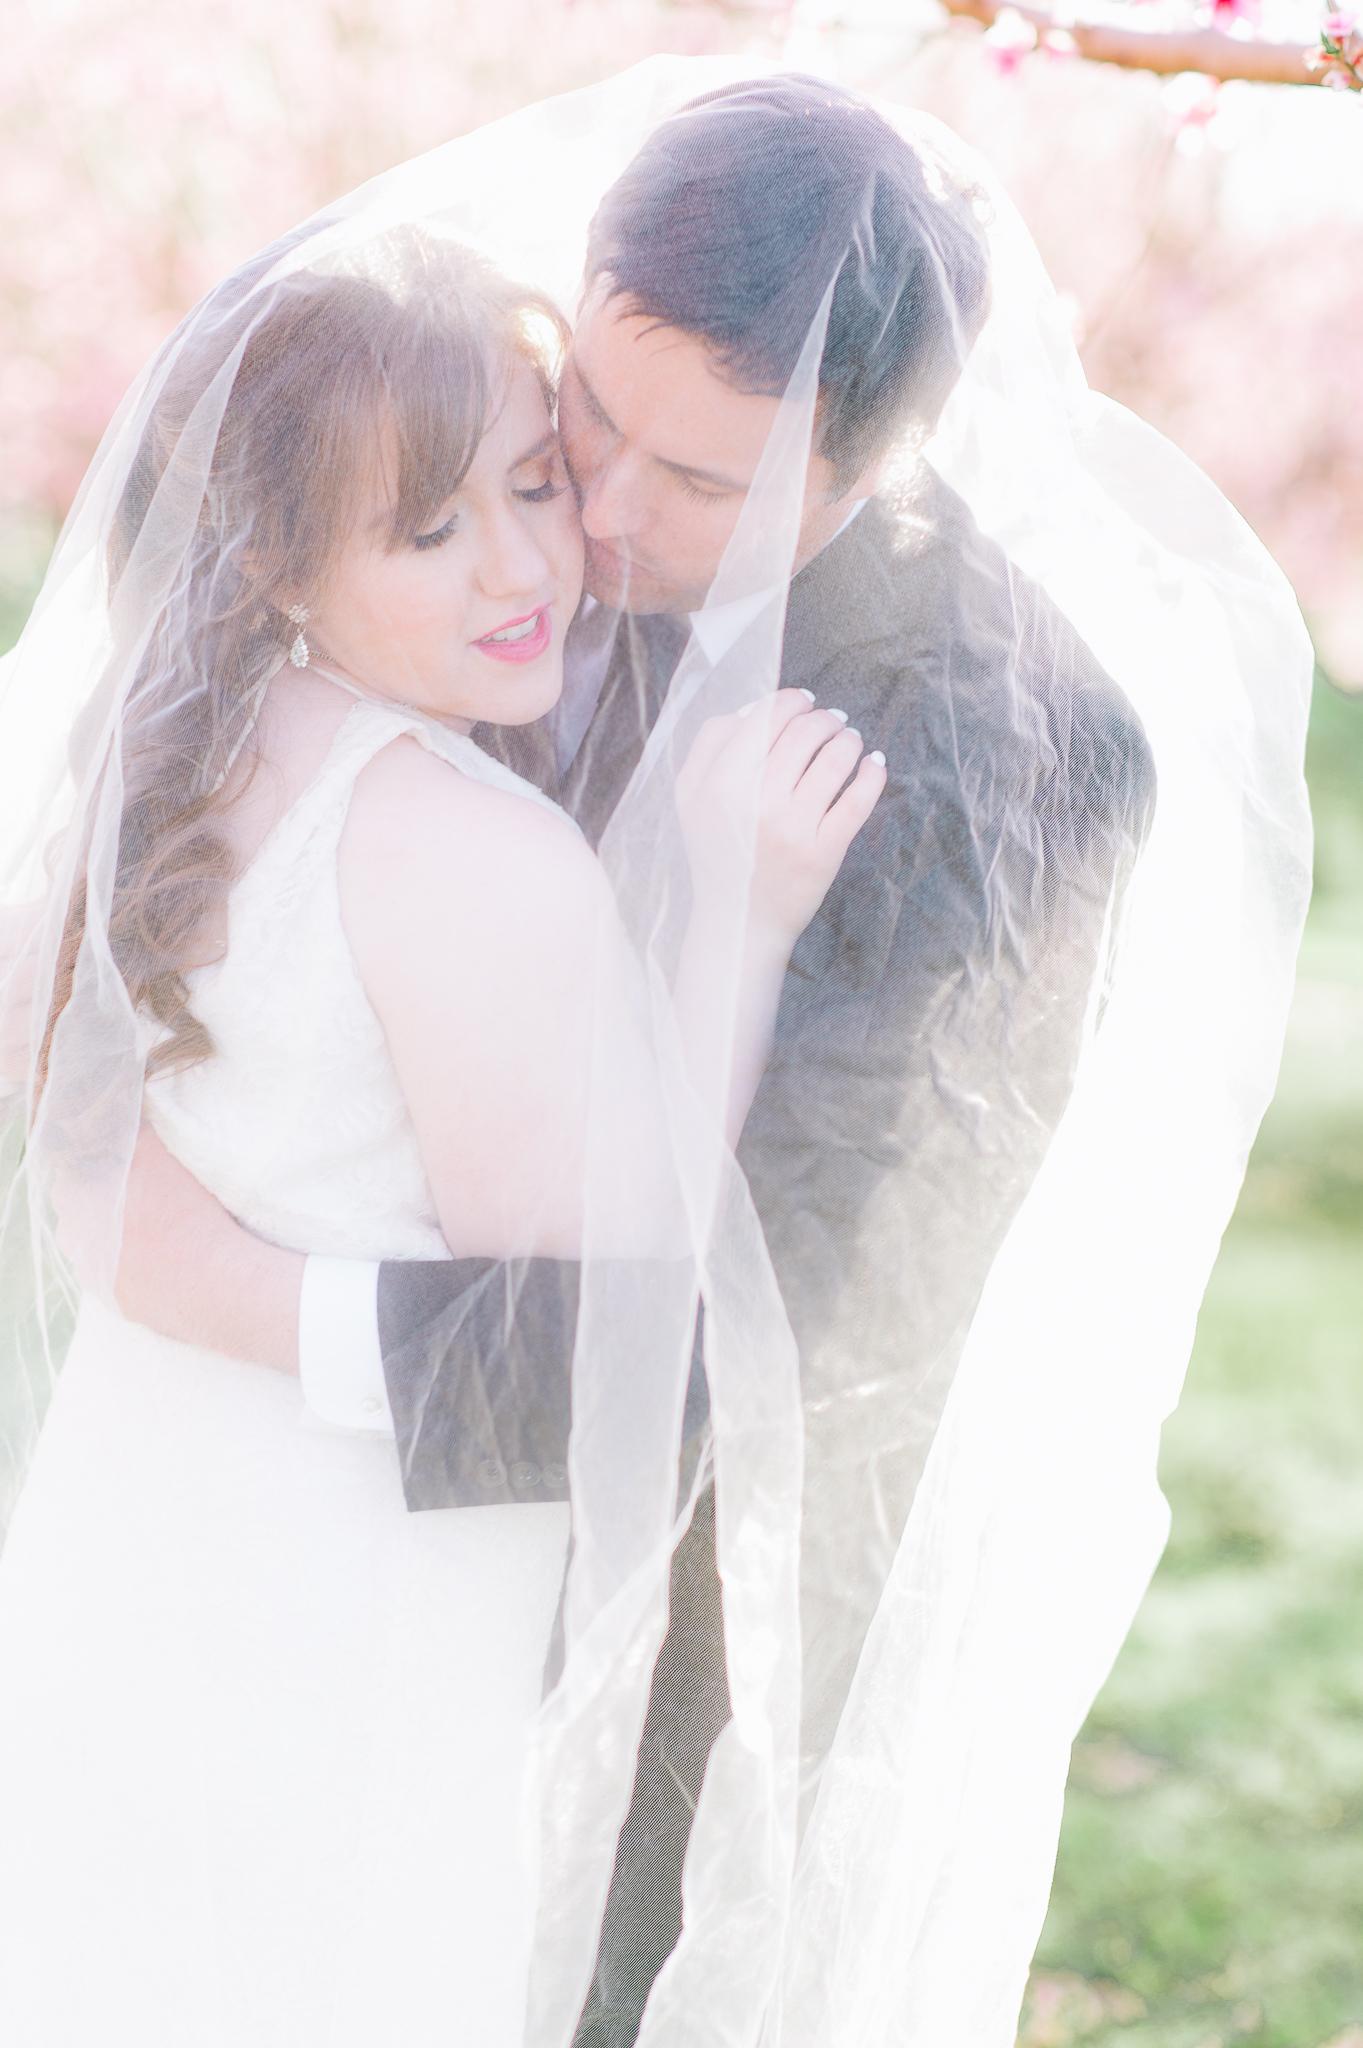 springwedding_cherryblossoms_virginiaphotographer_youseephotography_styledshoot (536).jpg